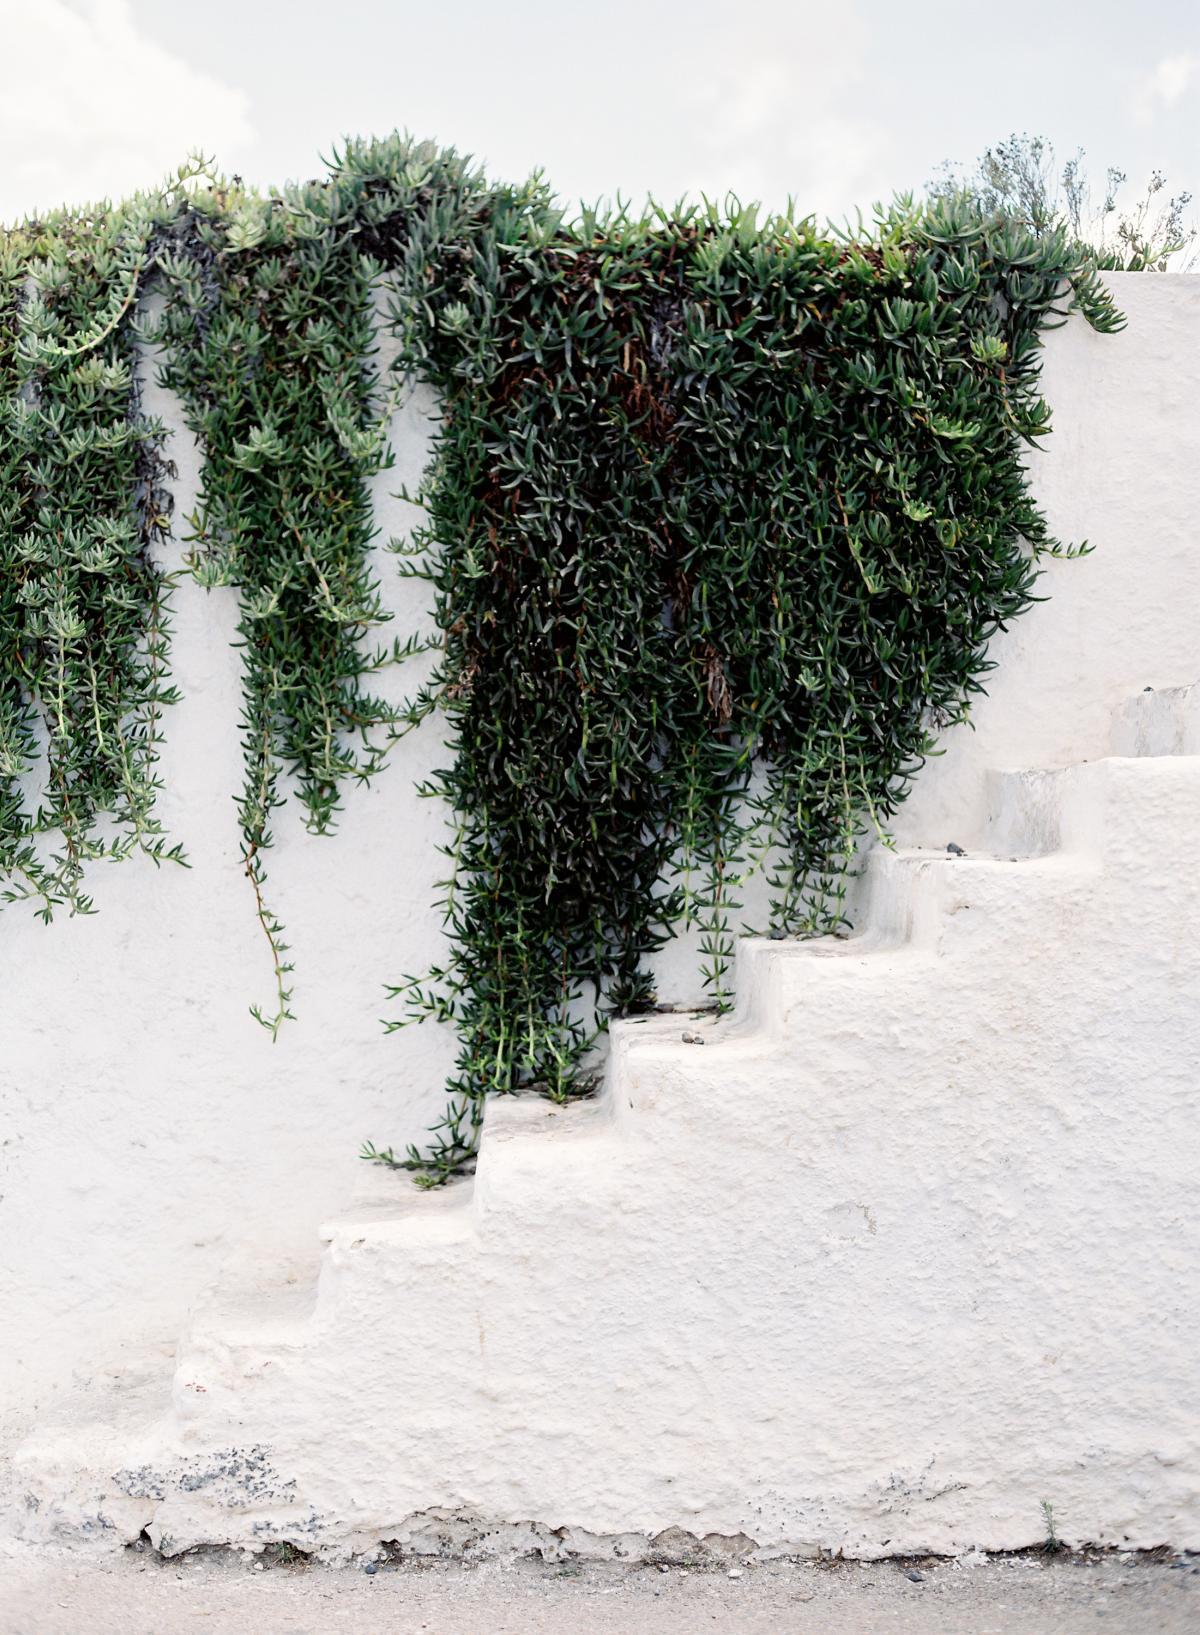 Santorini greece travel photos by omalley photographers 0002